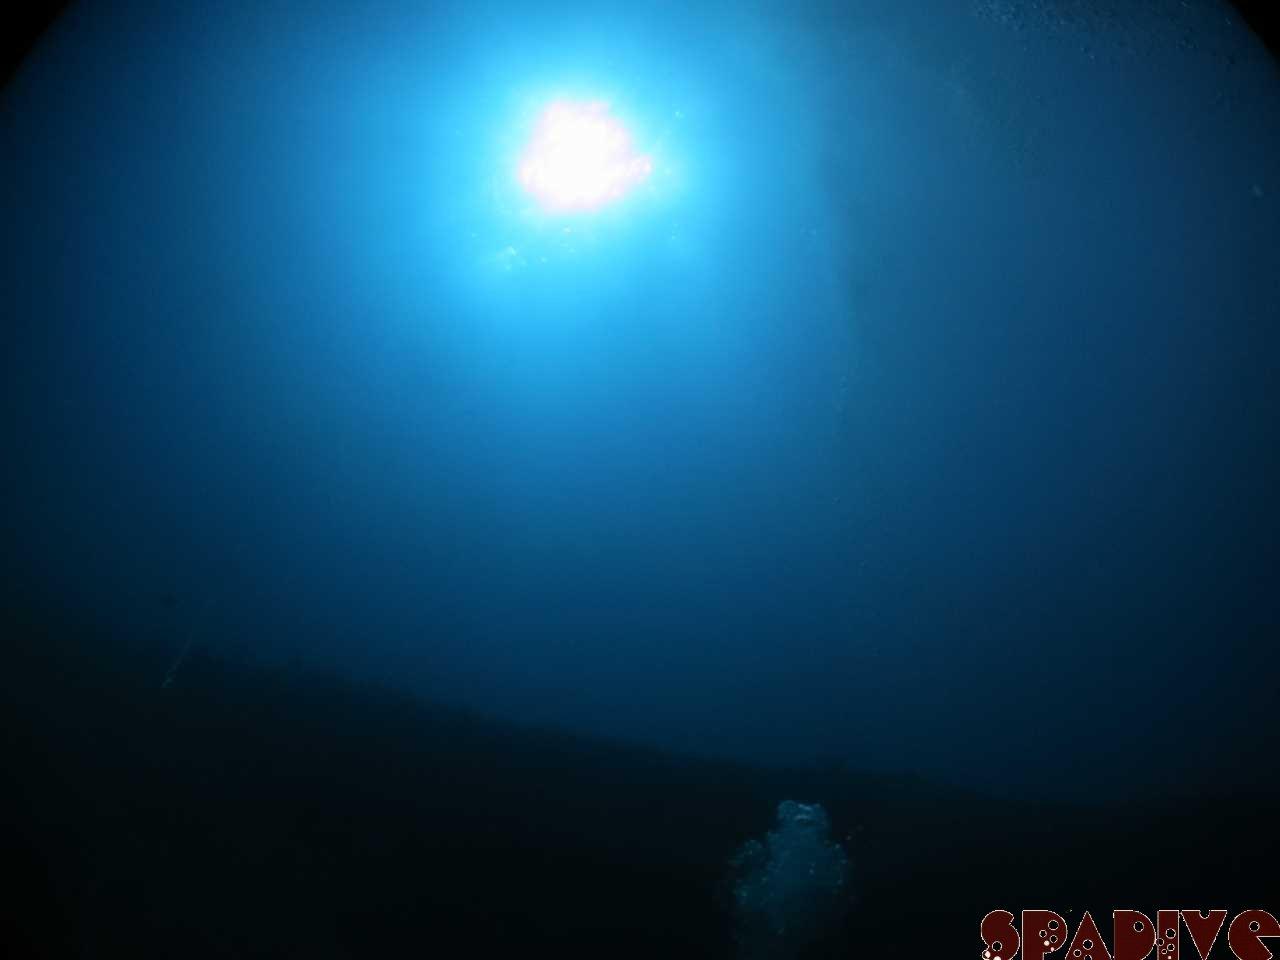 Wアーチ&沈船ボートファンダイビング(動画有)| 5/23/2013